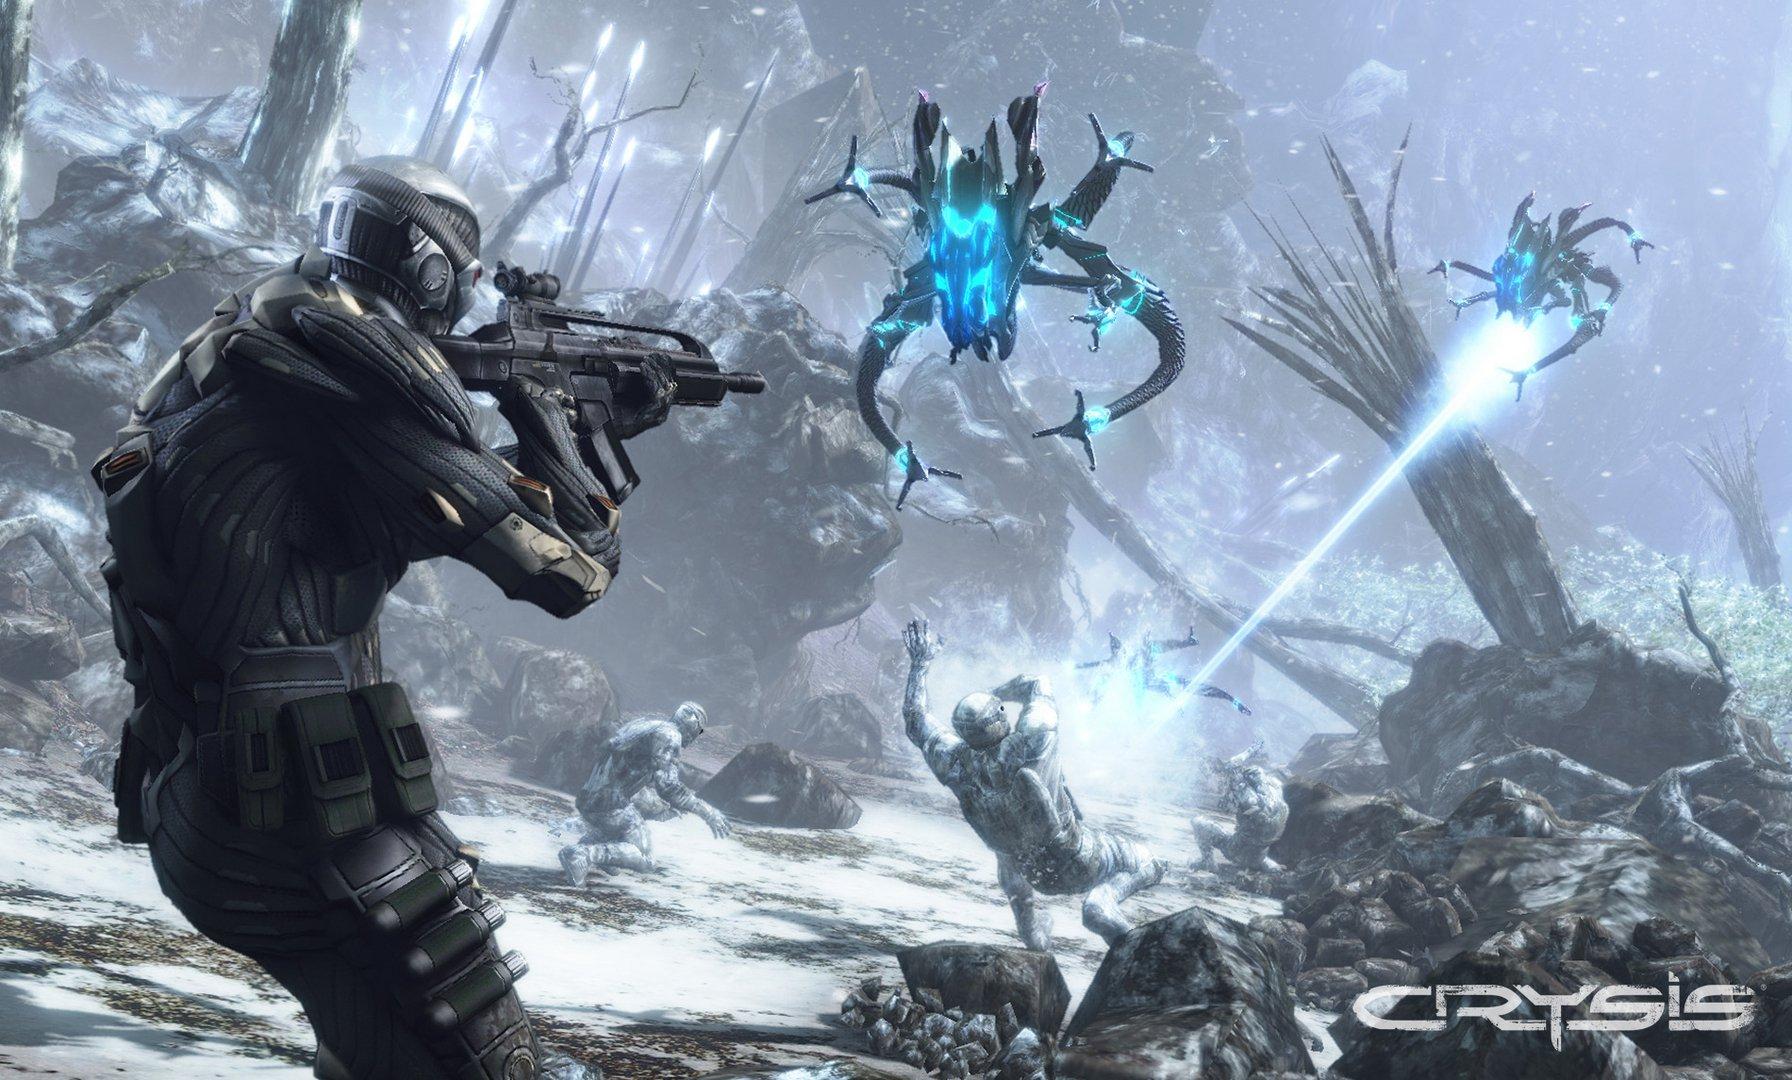 Crysis Maximum Edition 3